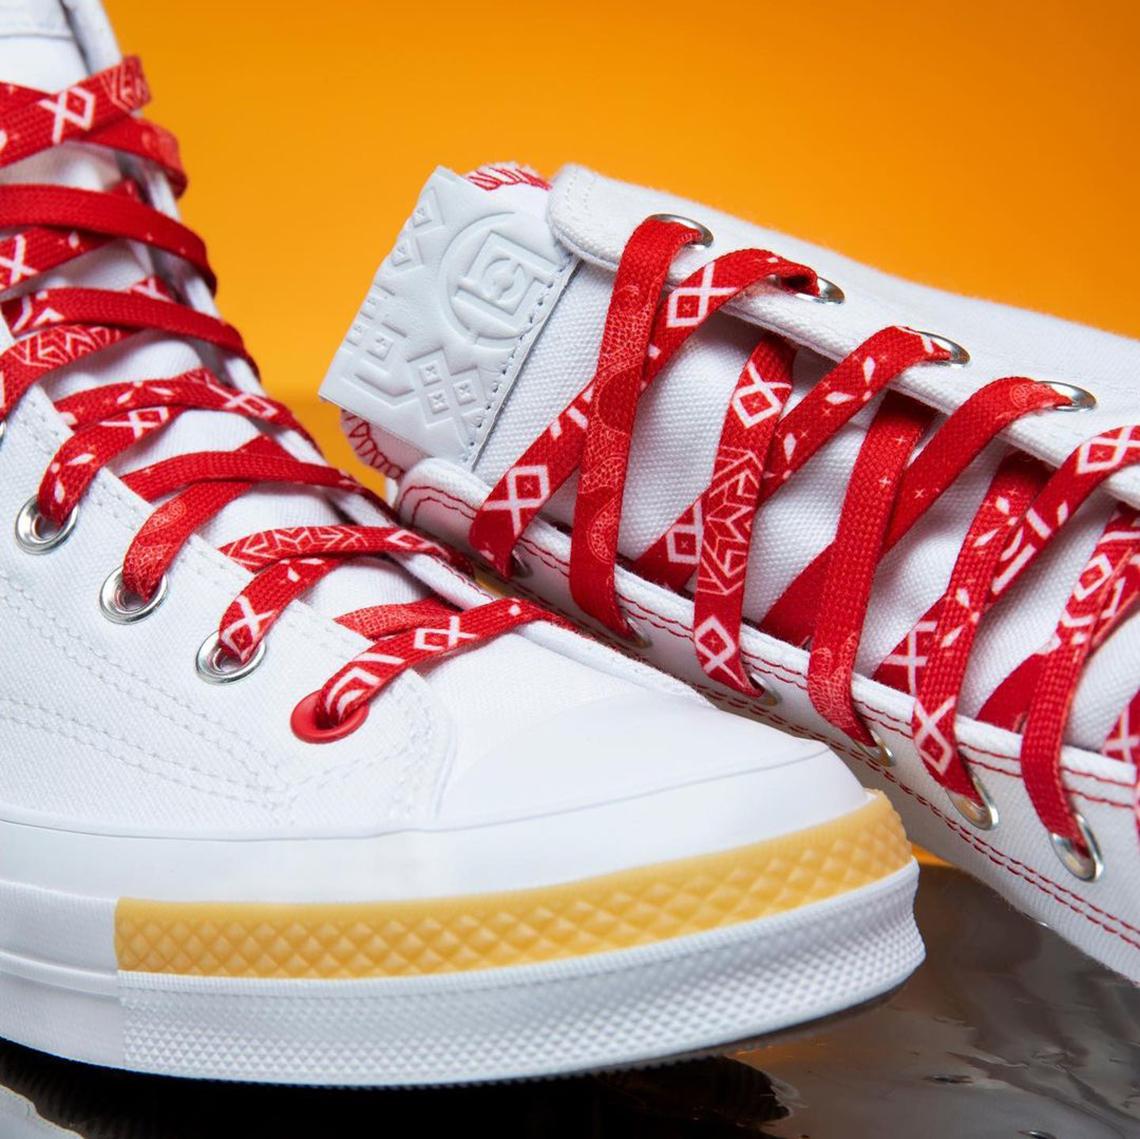 CLOT Converse Chuck 70 White Paloma Release Date   SneakerNews.com